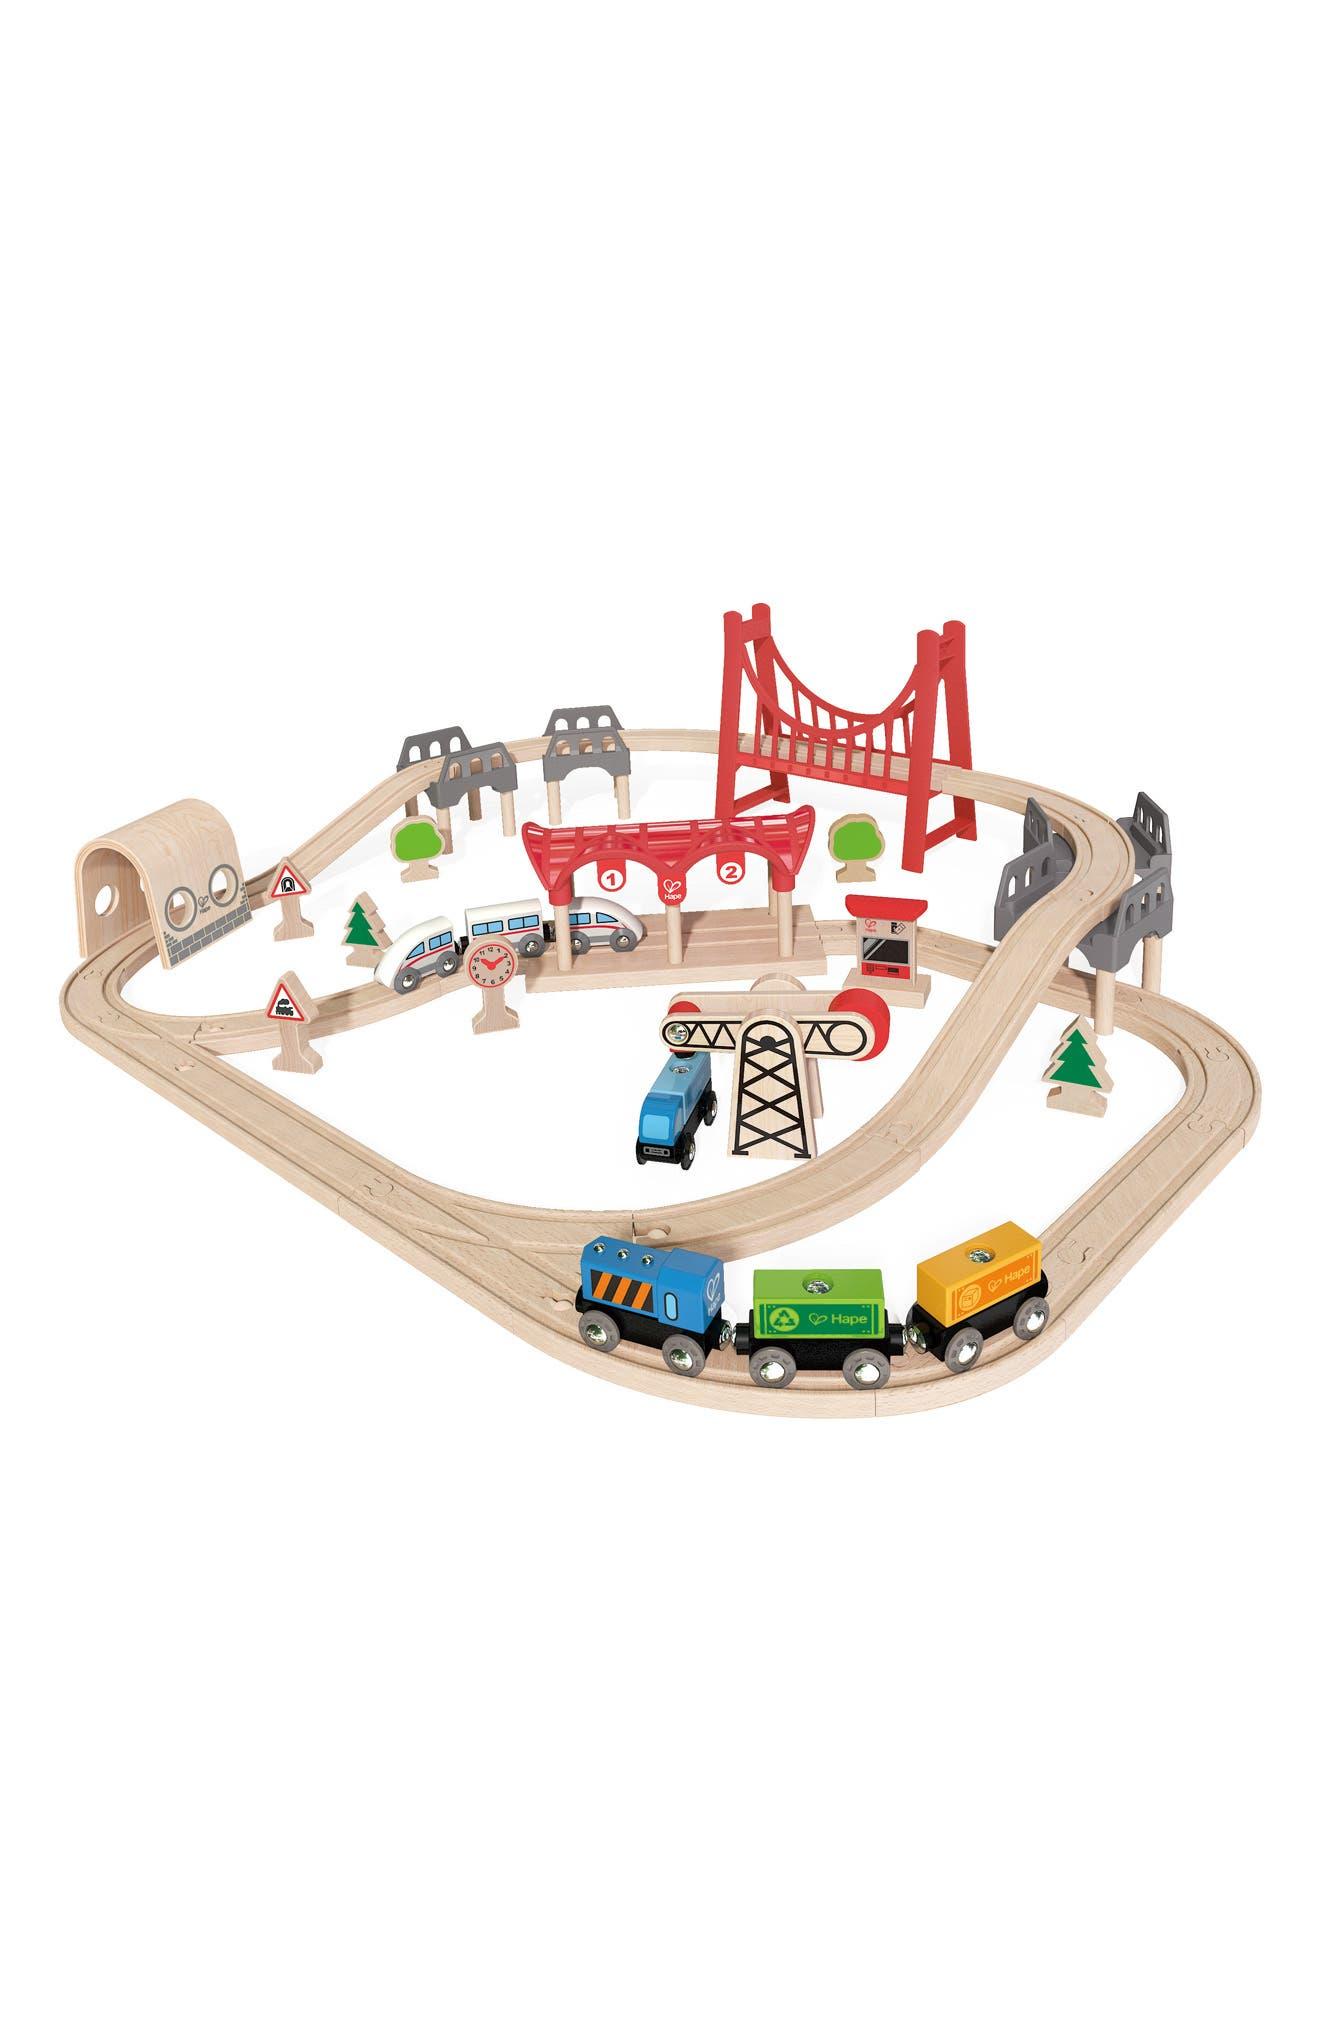 Double Loop Railway Wooden Train Set,                             Main thumbnail 1, color,                             250